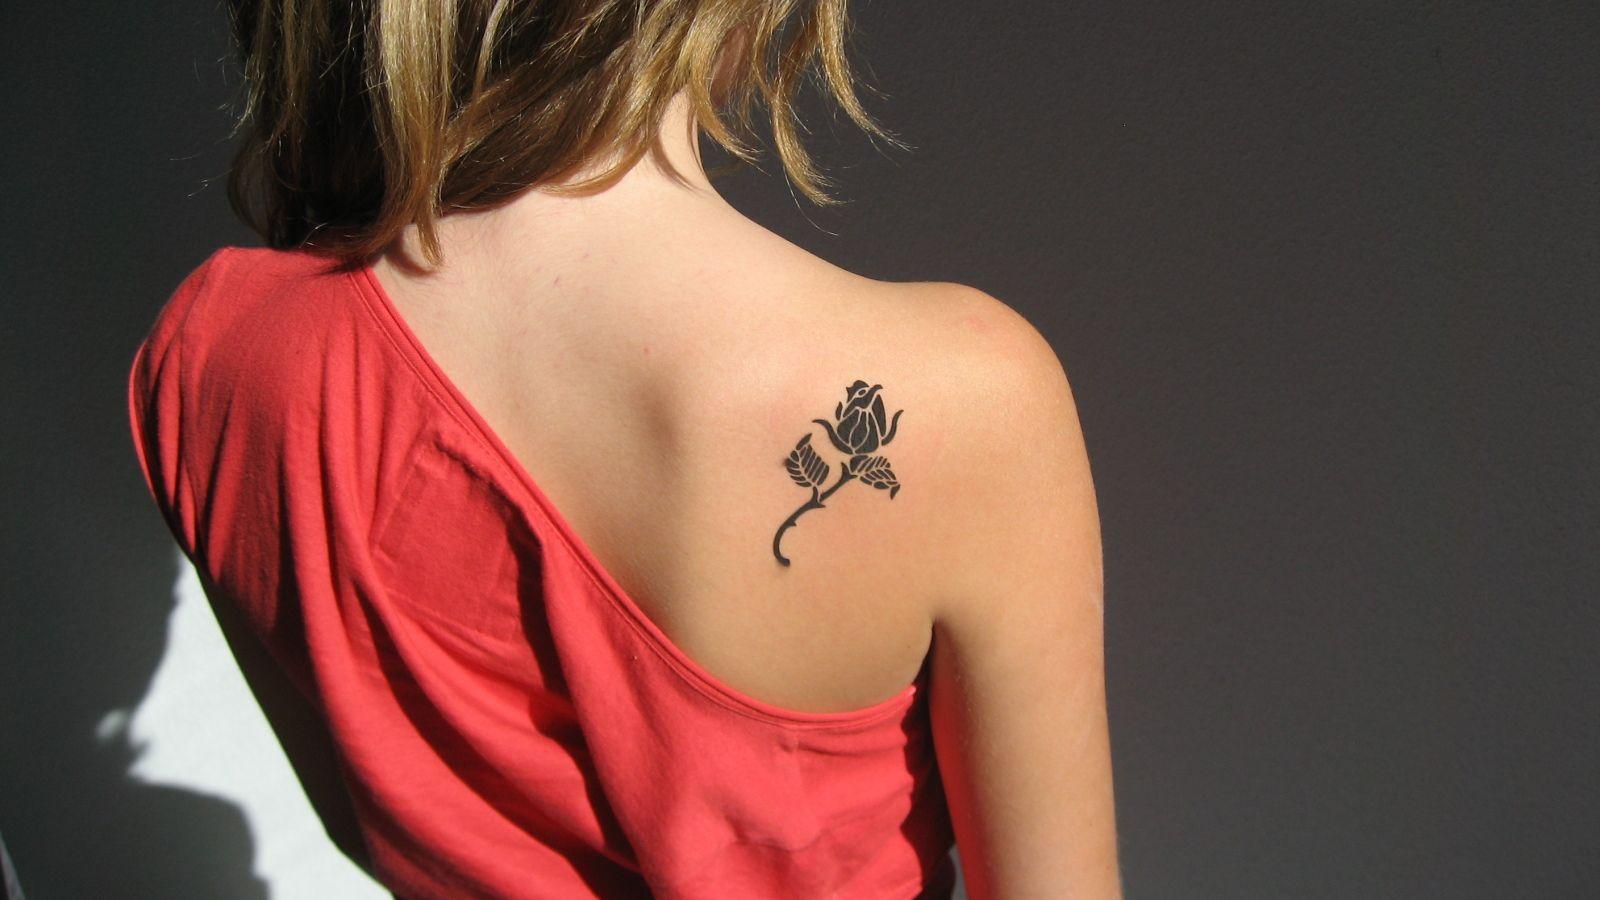 Back Shoulder Black Small Flower Tattoos Designs Tattoos regarding size 1600 X 900